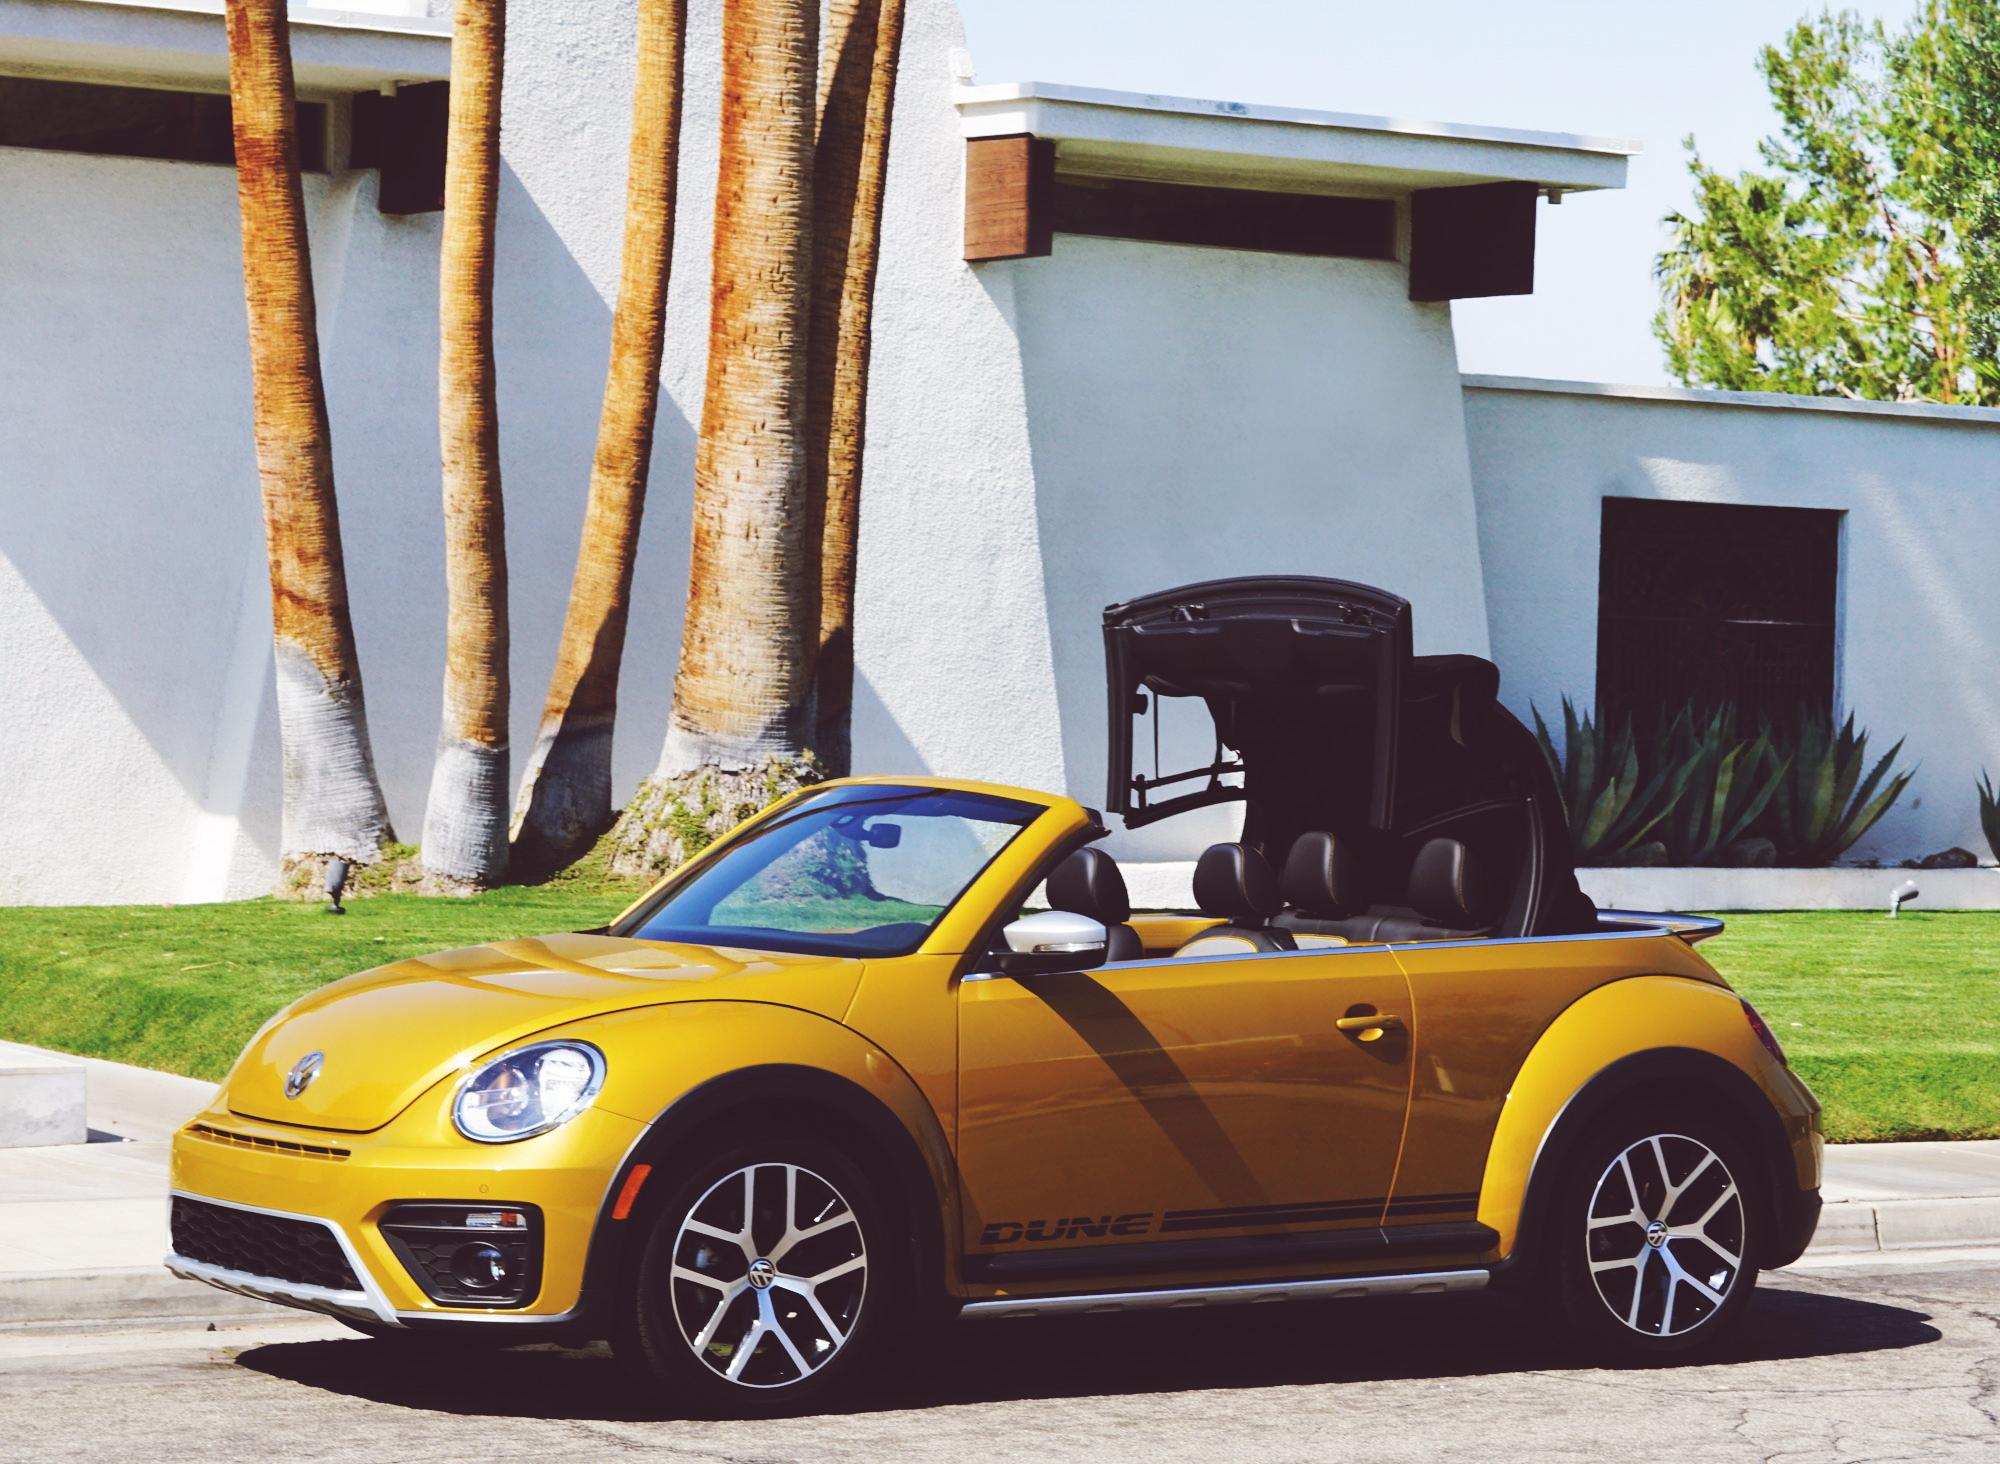 Volkswagen Dune Convertible in Palm Springs California